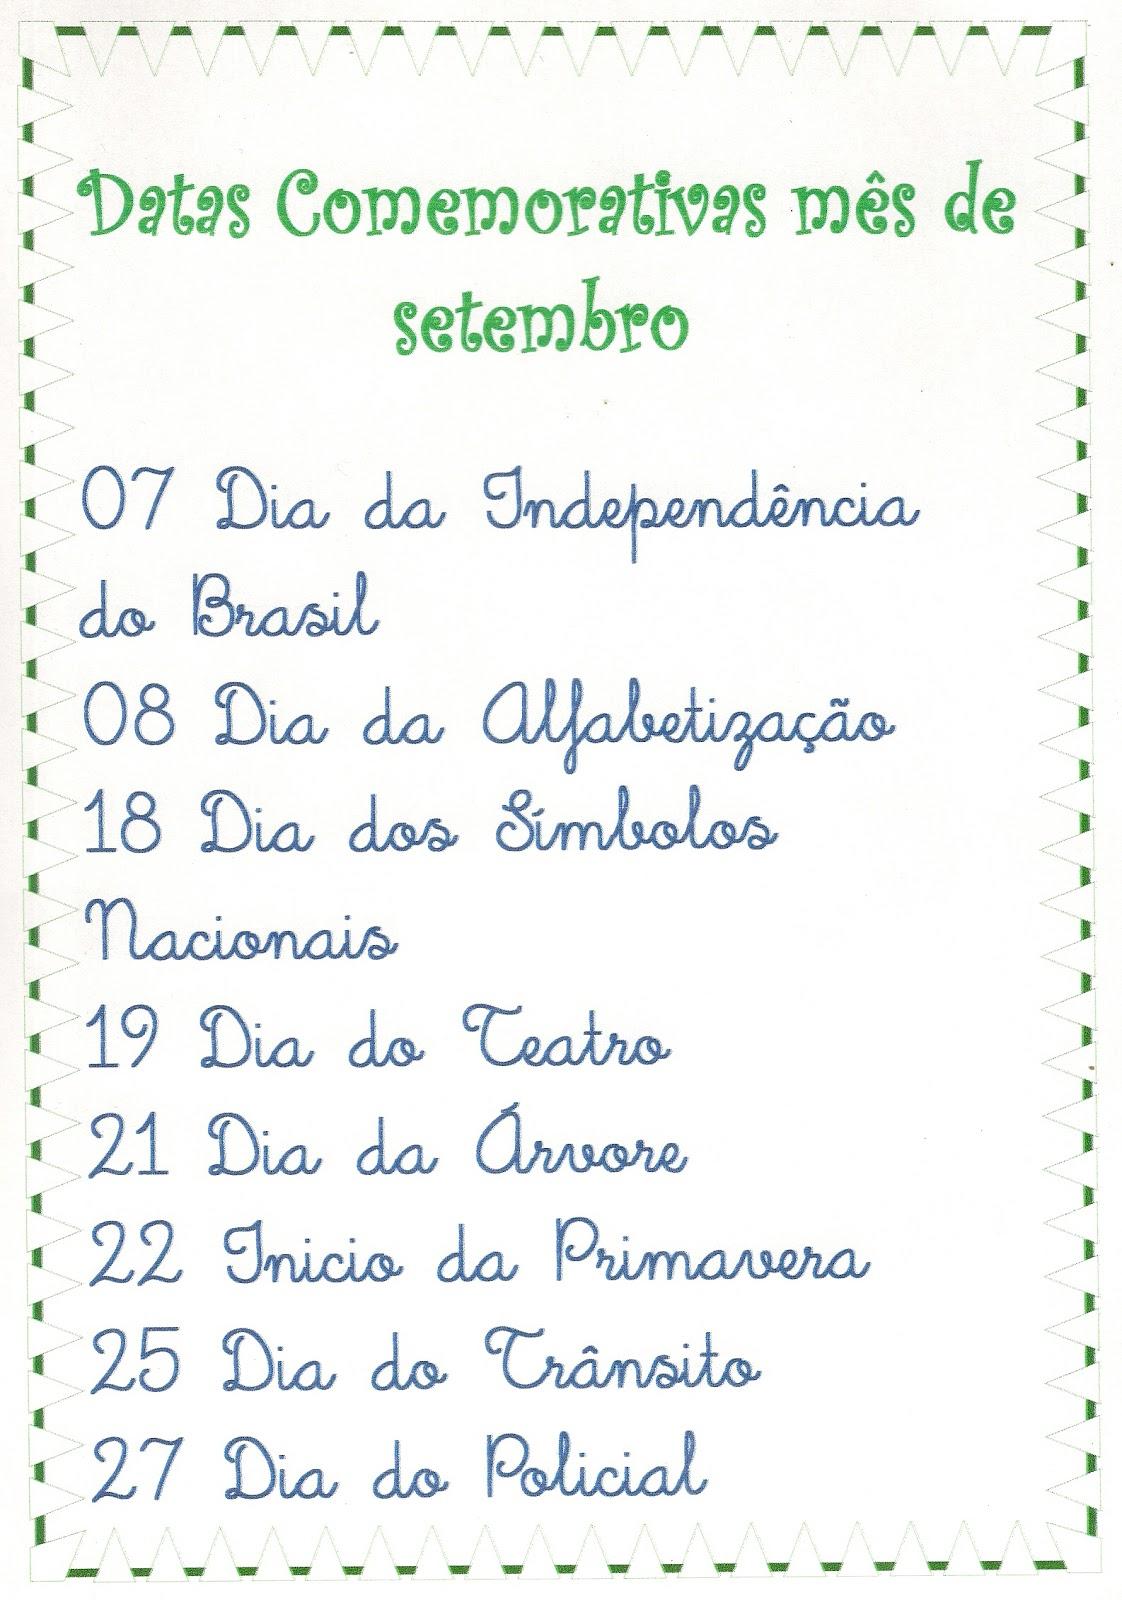 Calendario De Datas Comemorativas Mes De Setembro